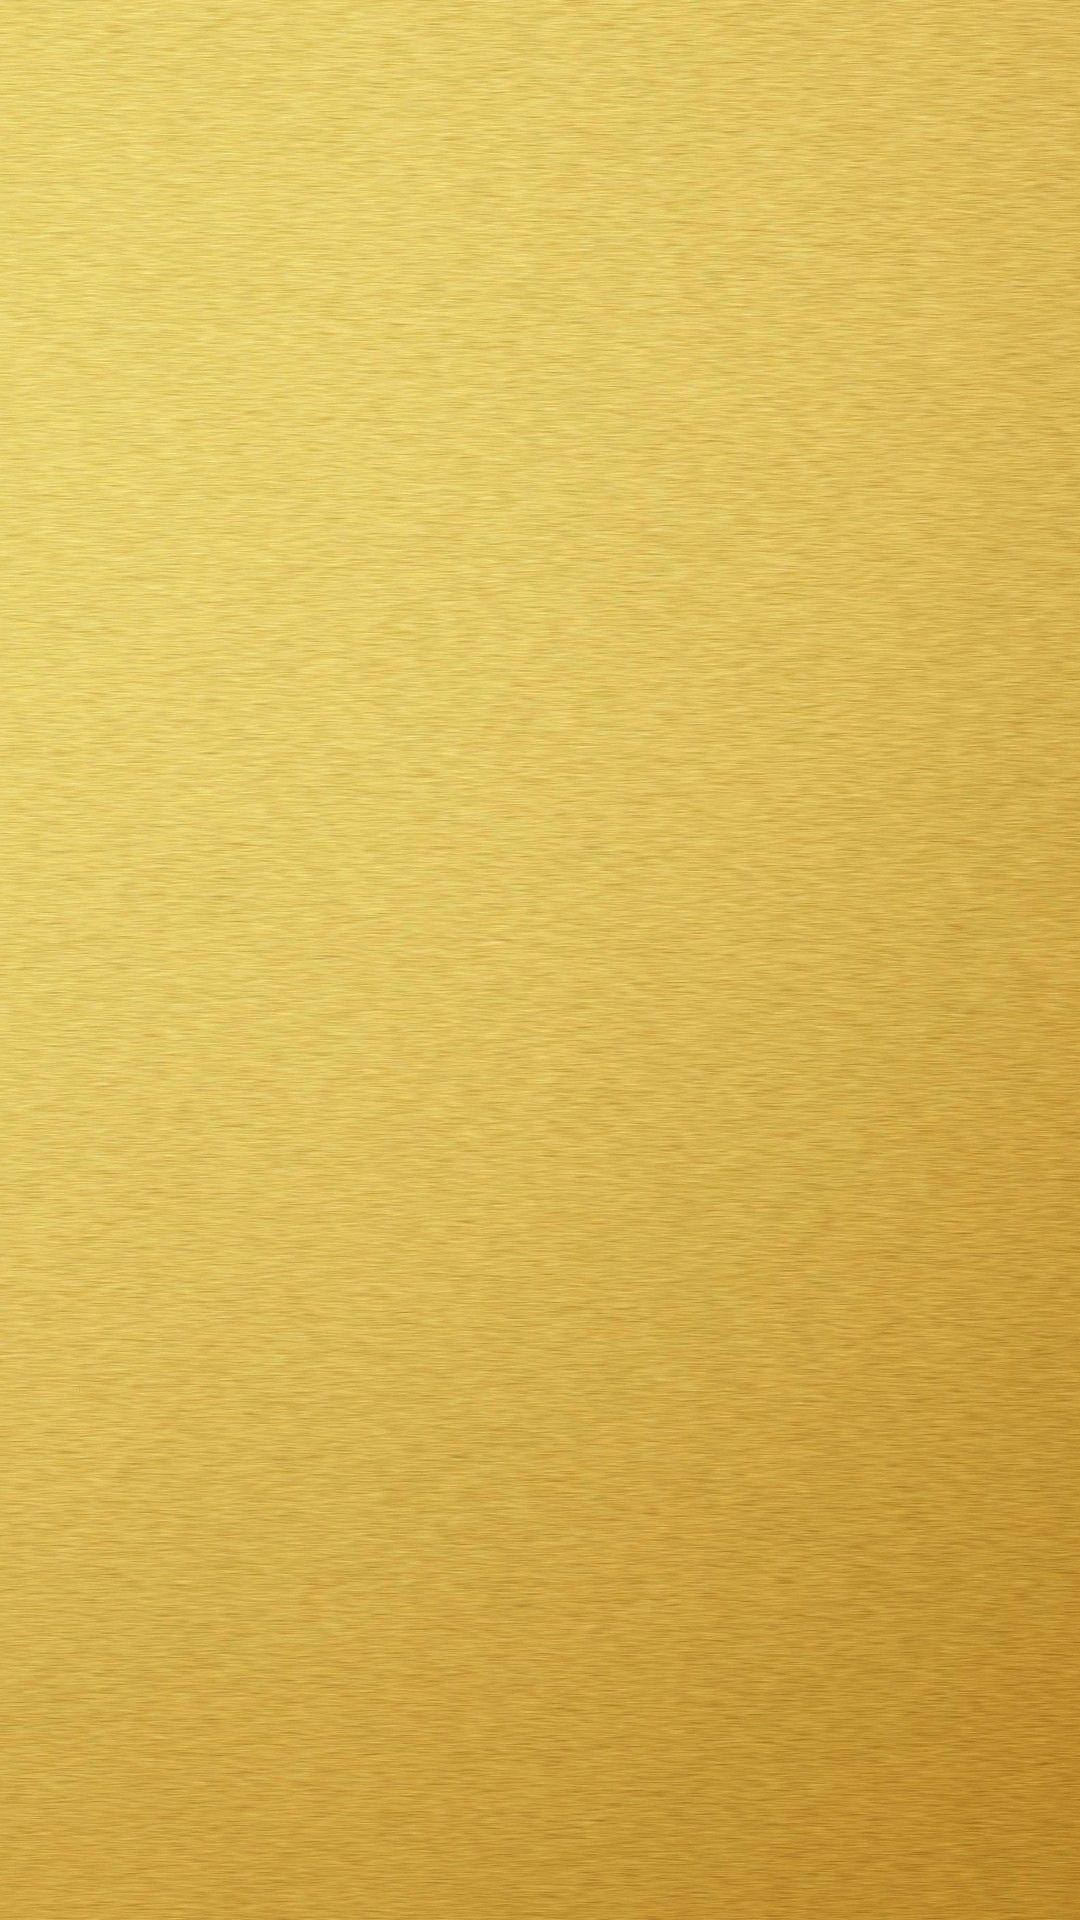 Wallpaper Plain Gold Iphone Gold Wallpaper Colour Gold